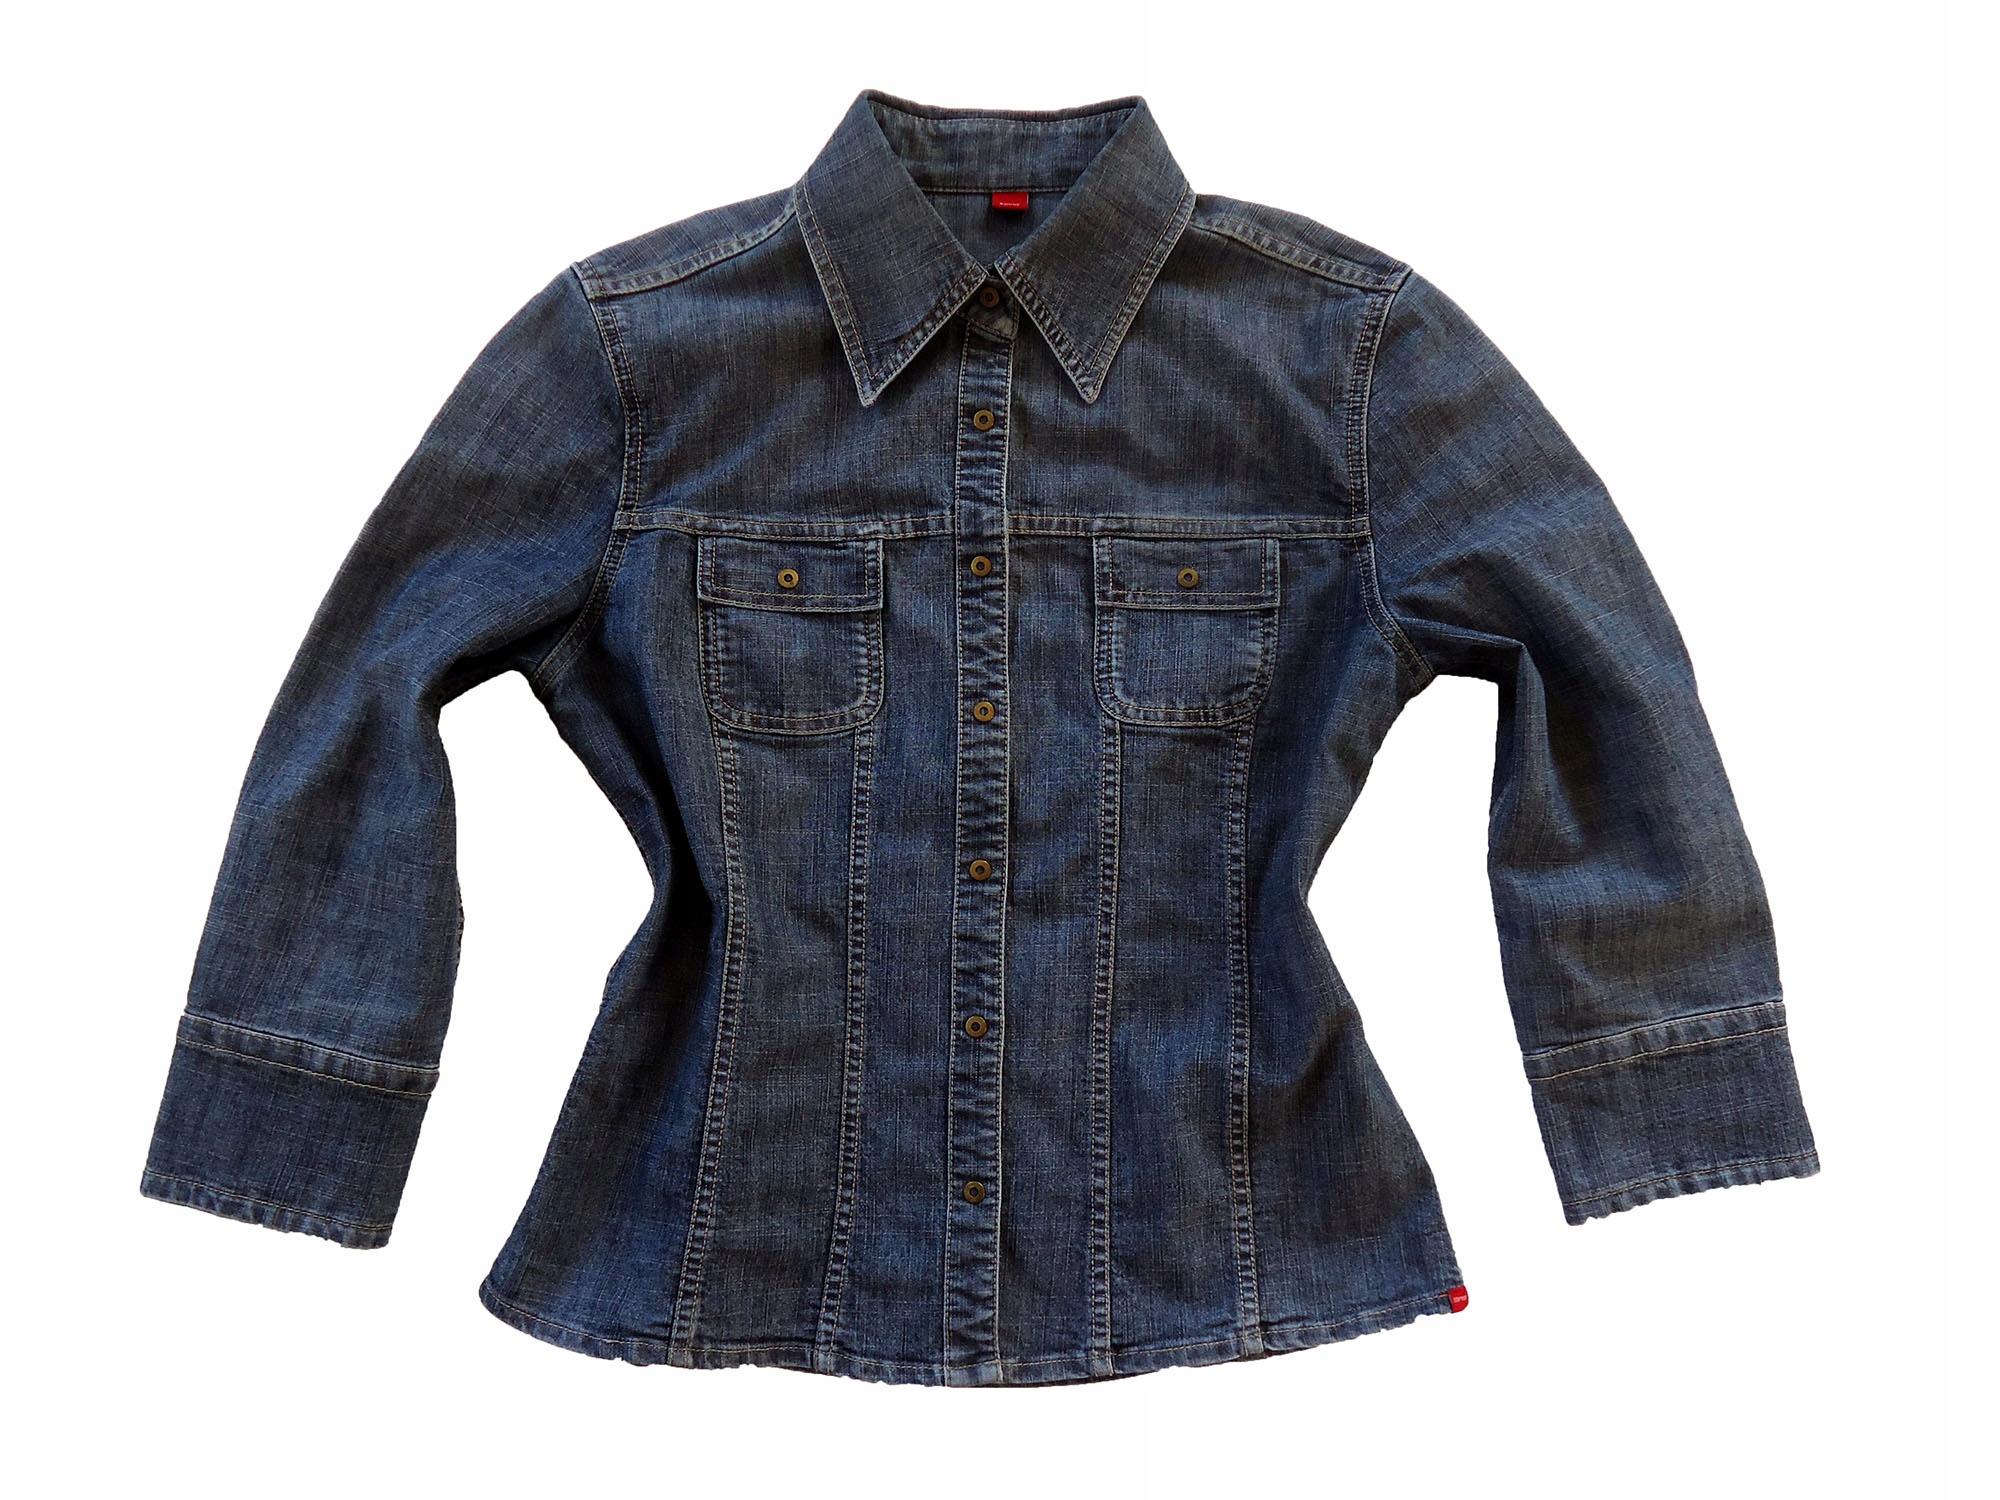 ESPIRIT świetna jeansowa kurtka koszula 40 BDB